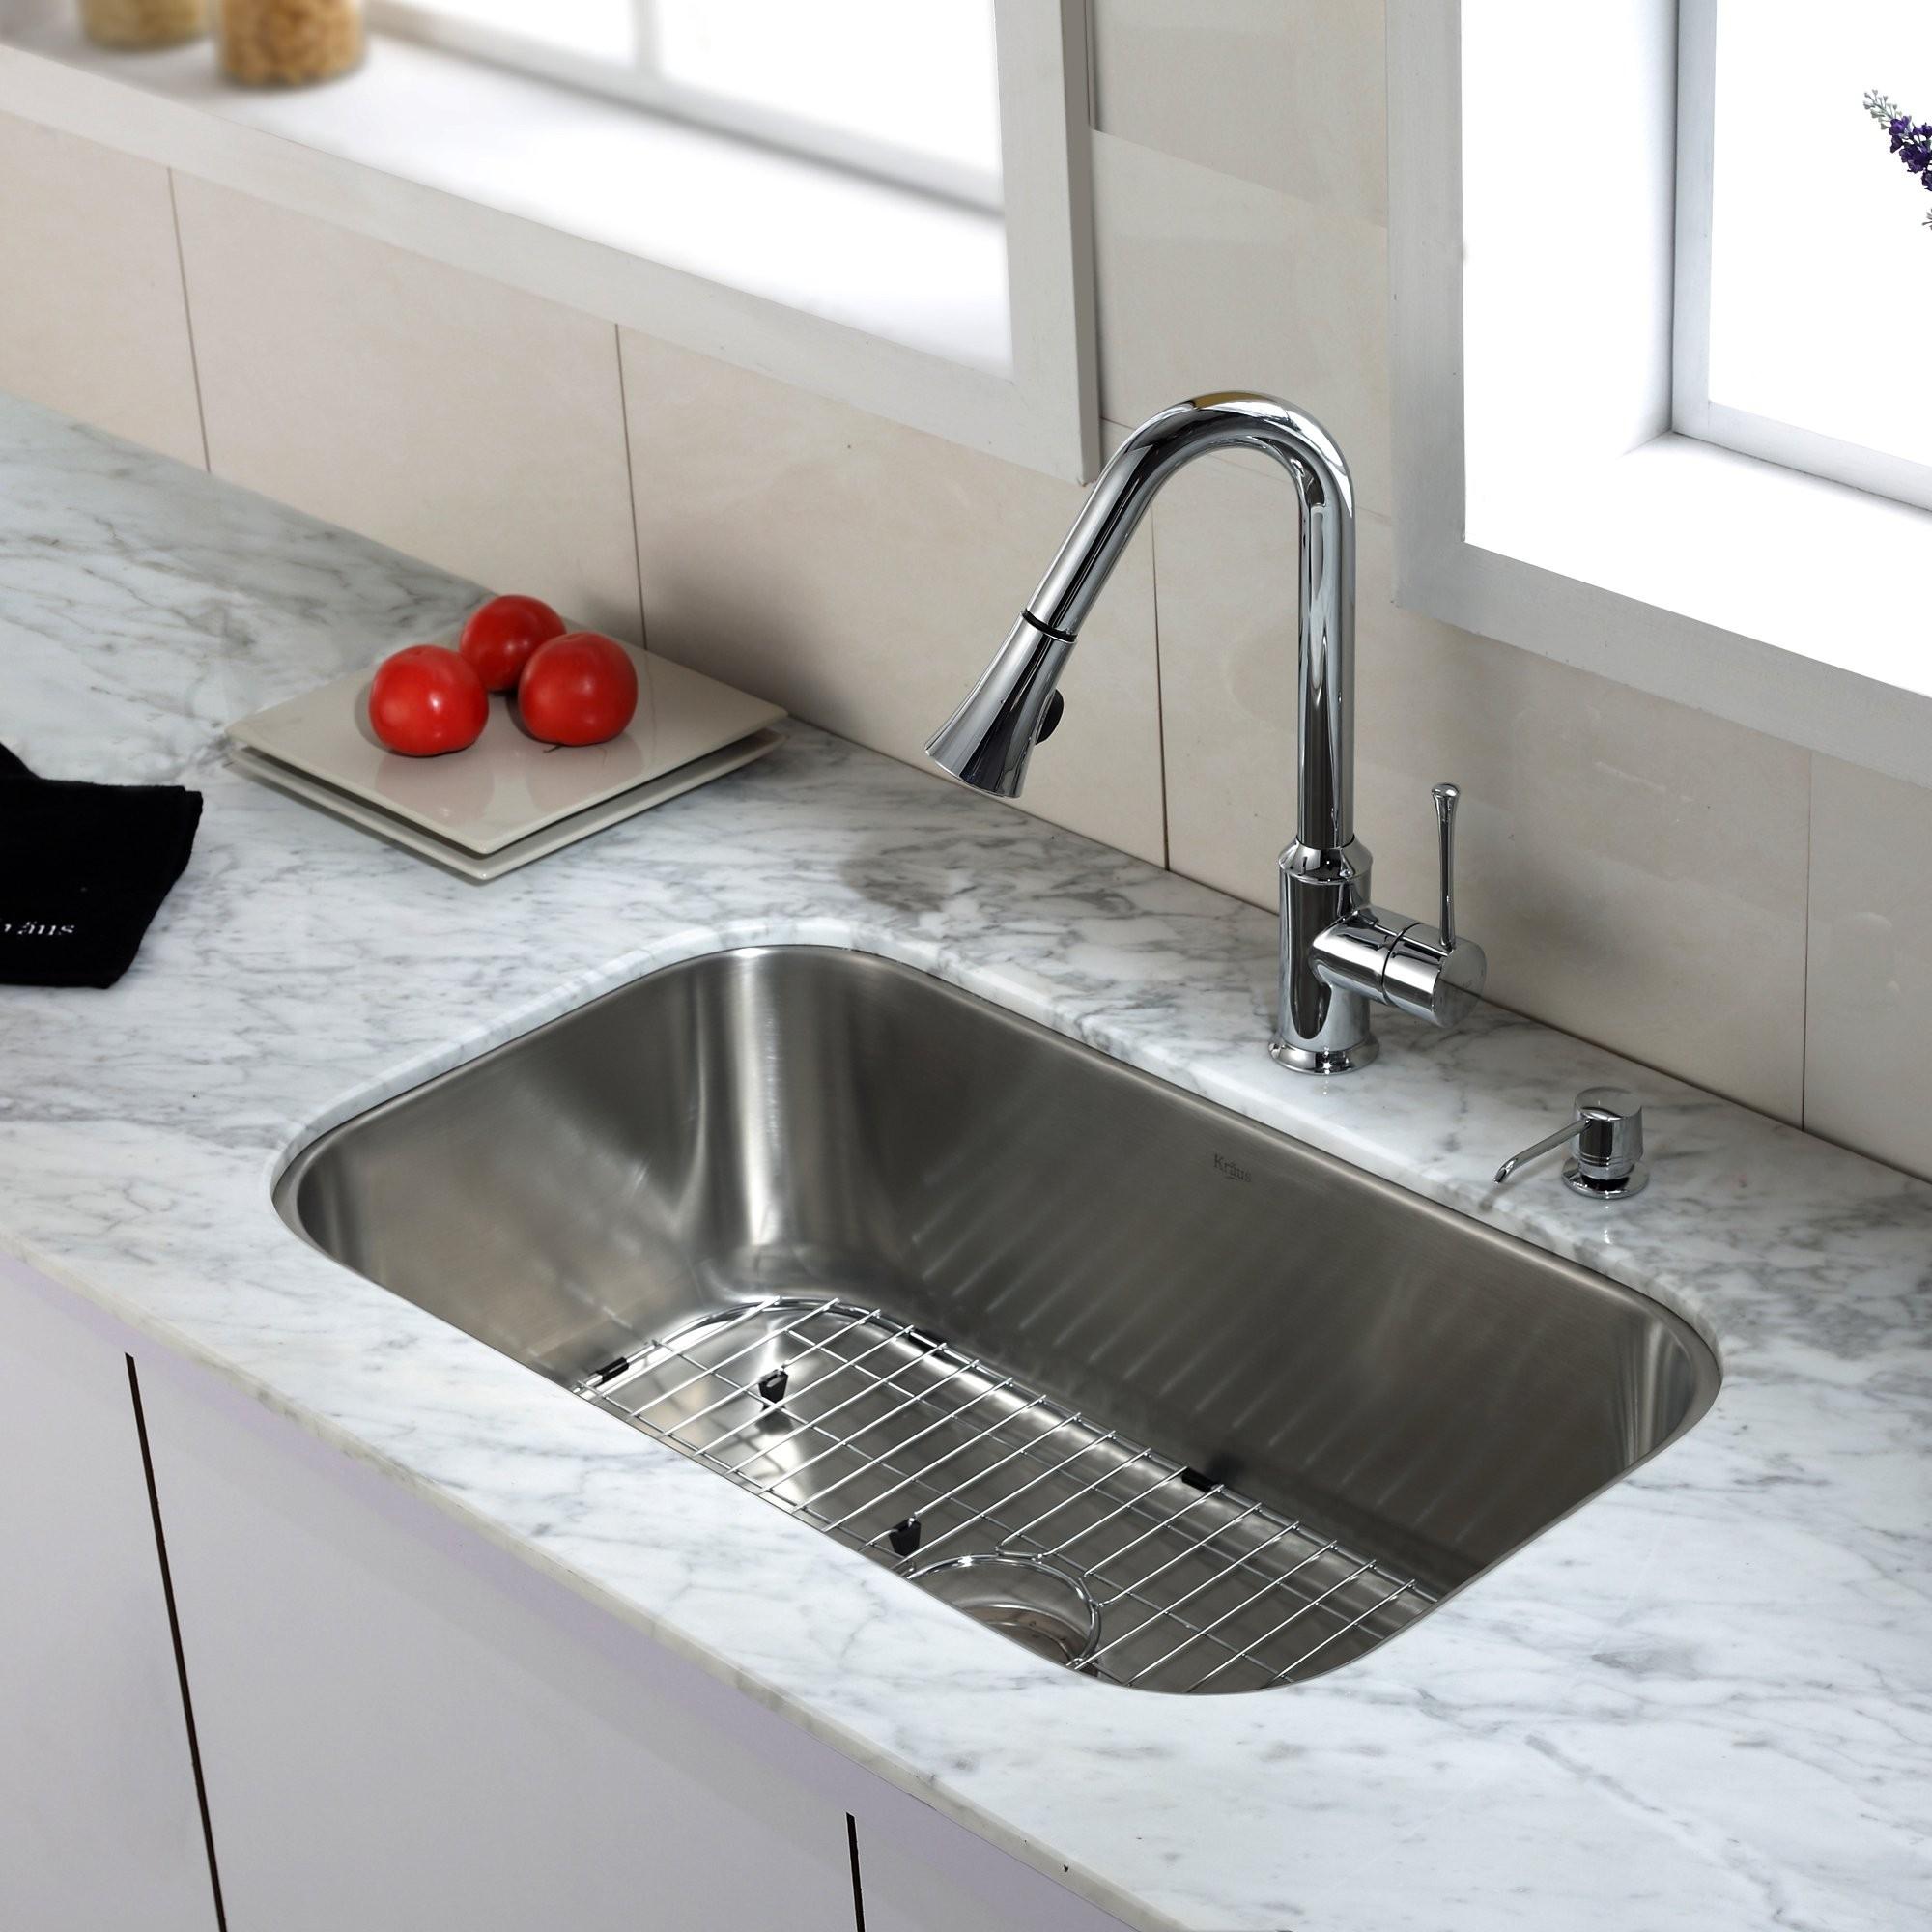 Ideas, undermount kitchen sink and faucet combo undermount kitchen sink and faucet combo stainless steel kitchen sink combination kraususa 2000 x 2000 3  .